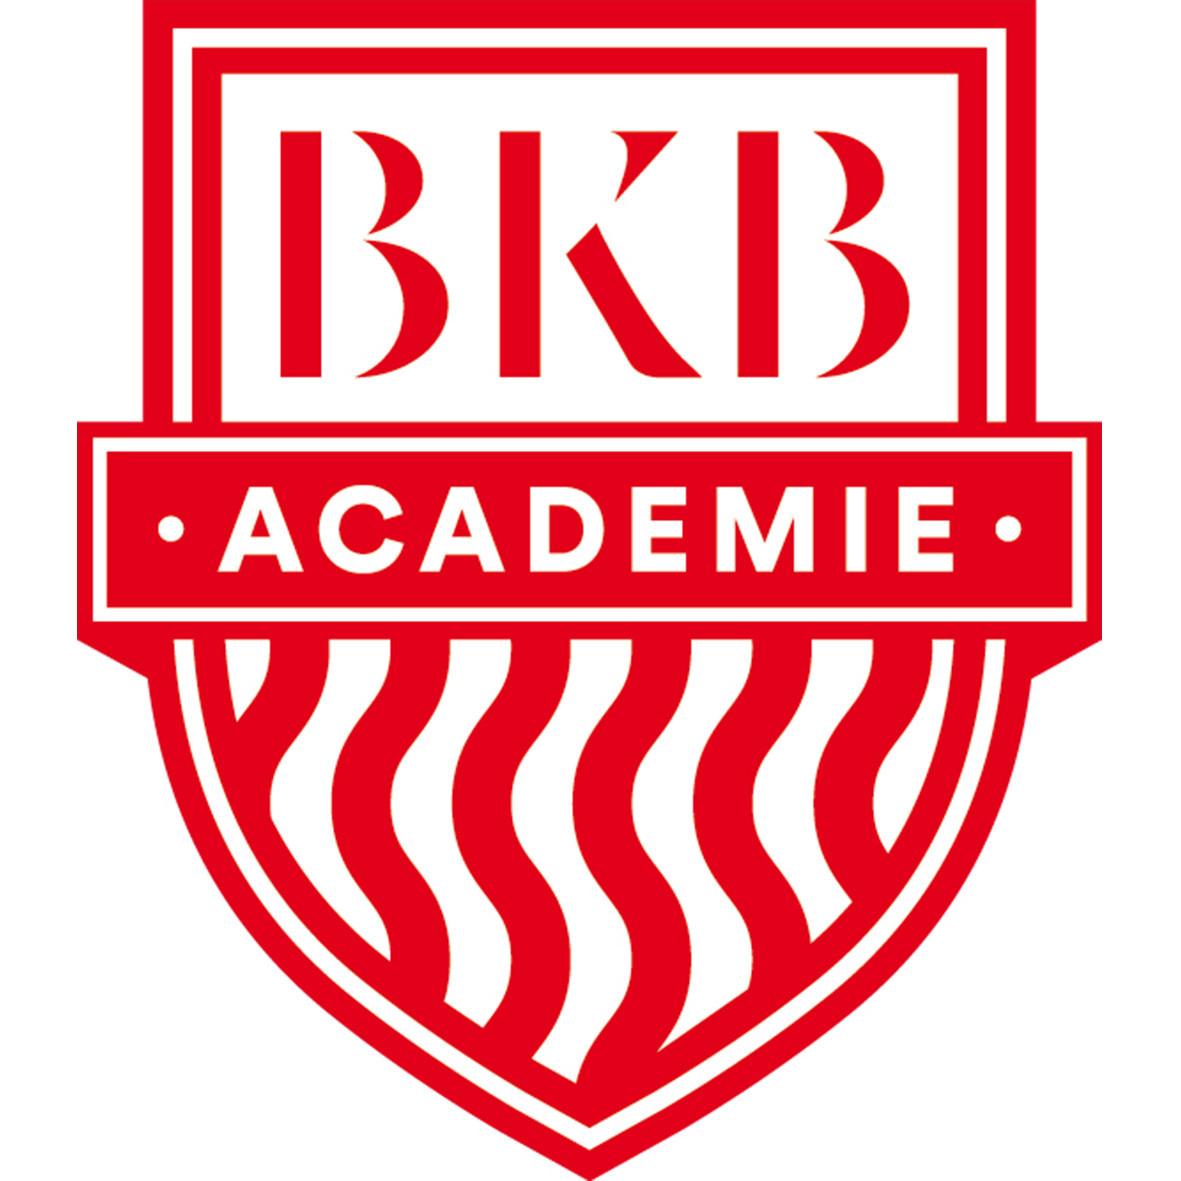 BKB Academie